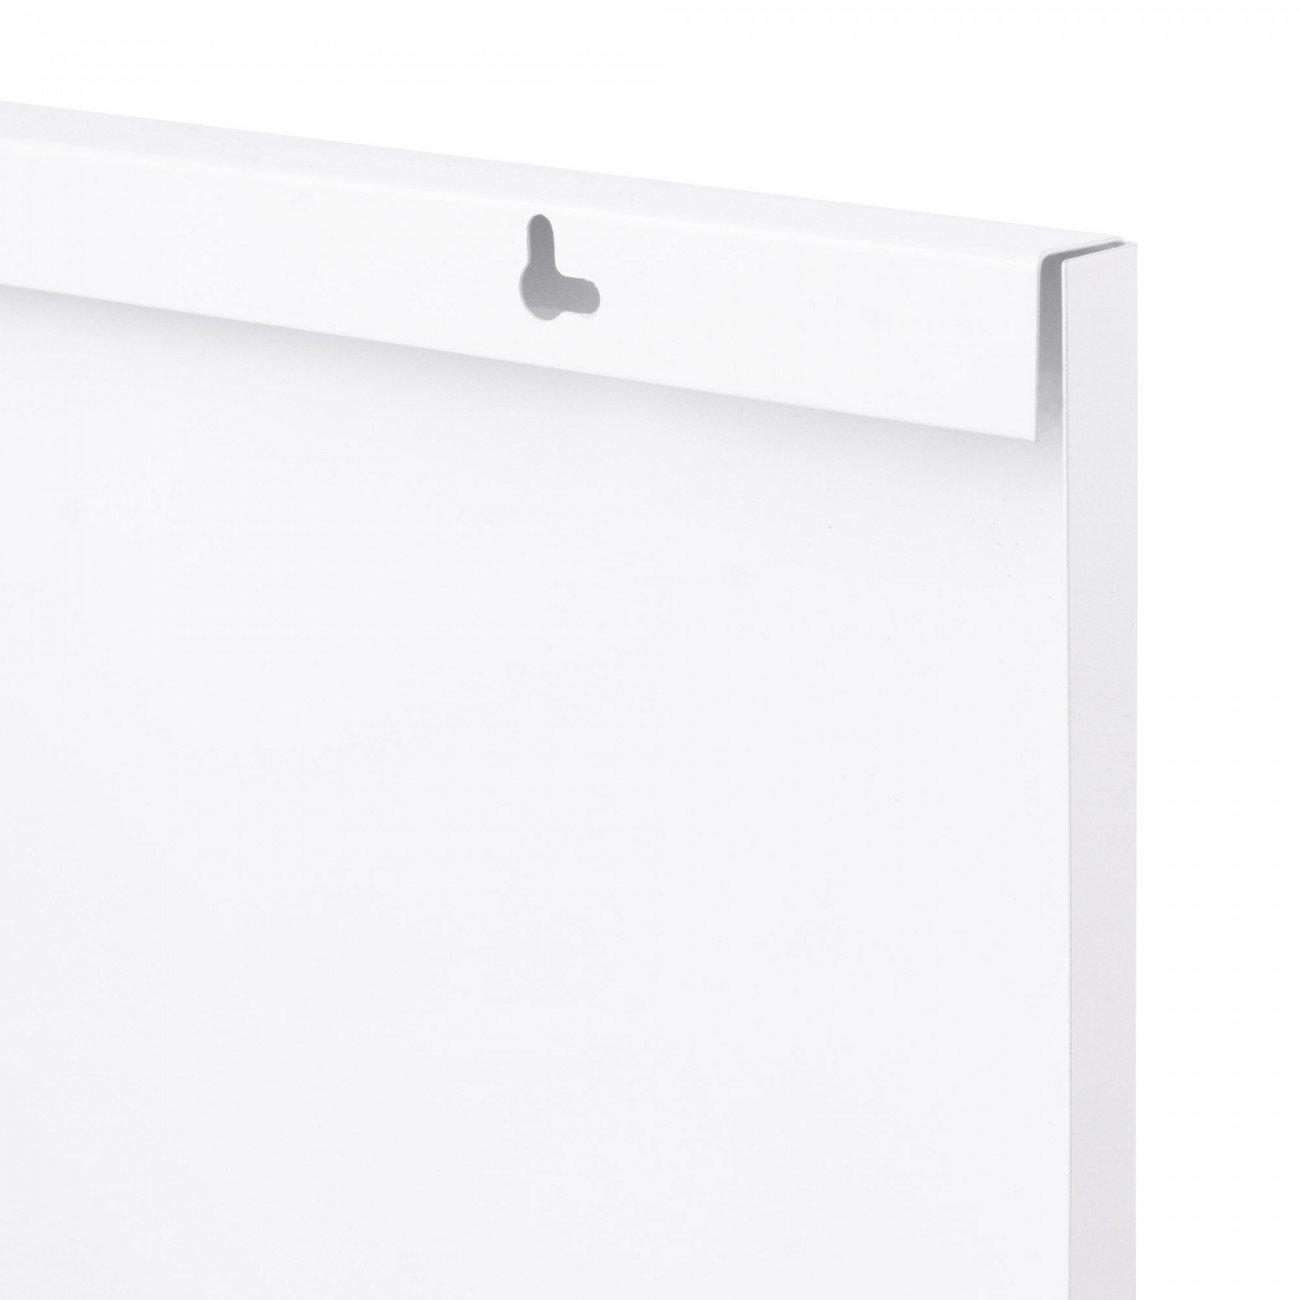 Pinnwand metall elegant magnettafel memoboard whiteboard pinnwand farbe rot inkl zubehr gren - Magnetische wandtafel ...